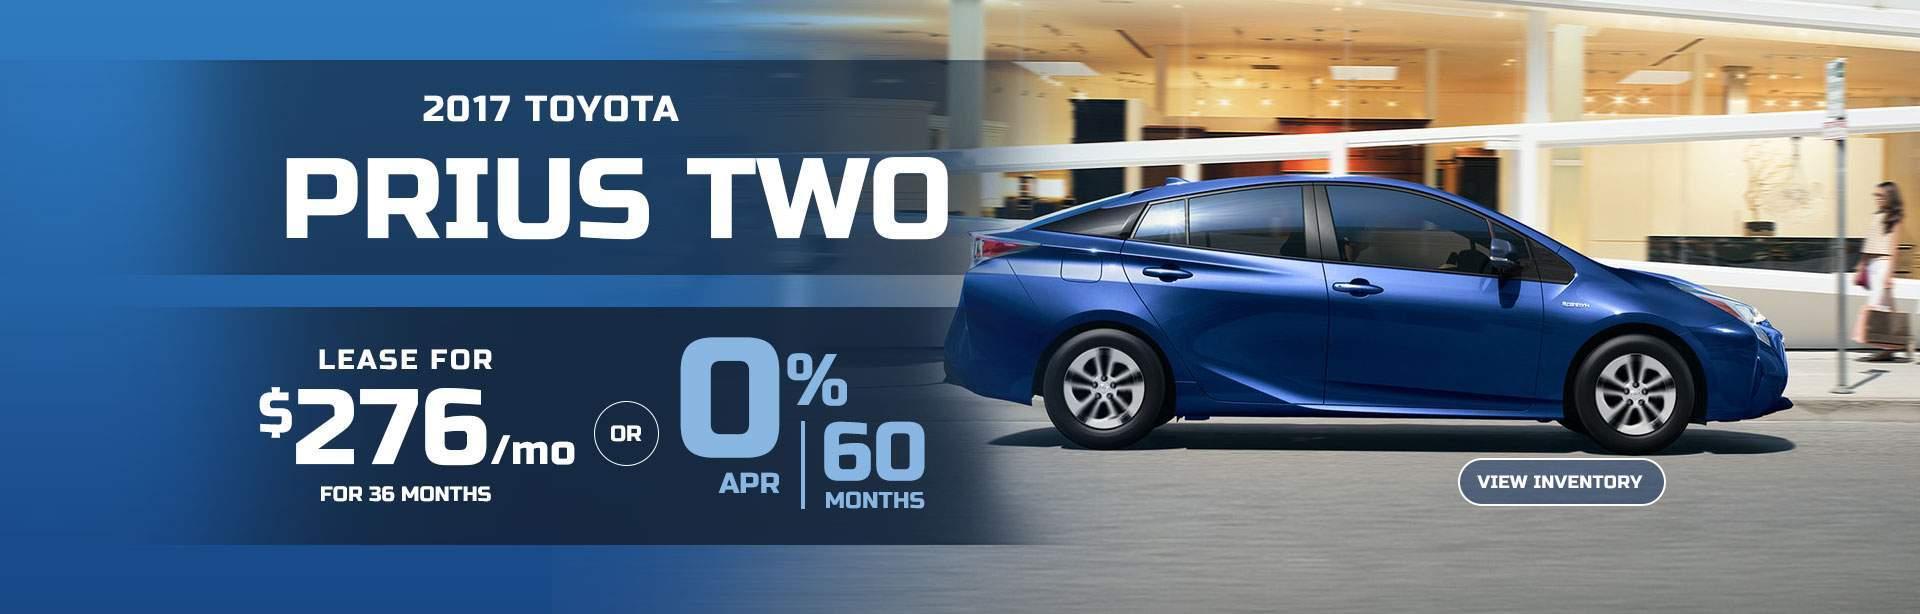 Oil Change Specials Near Me >> Toyota Dealership near me | Waite Park, MN